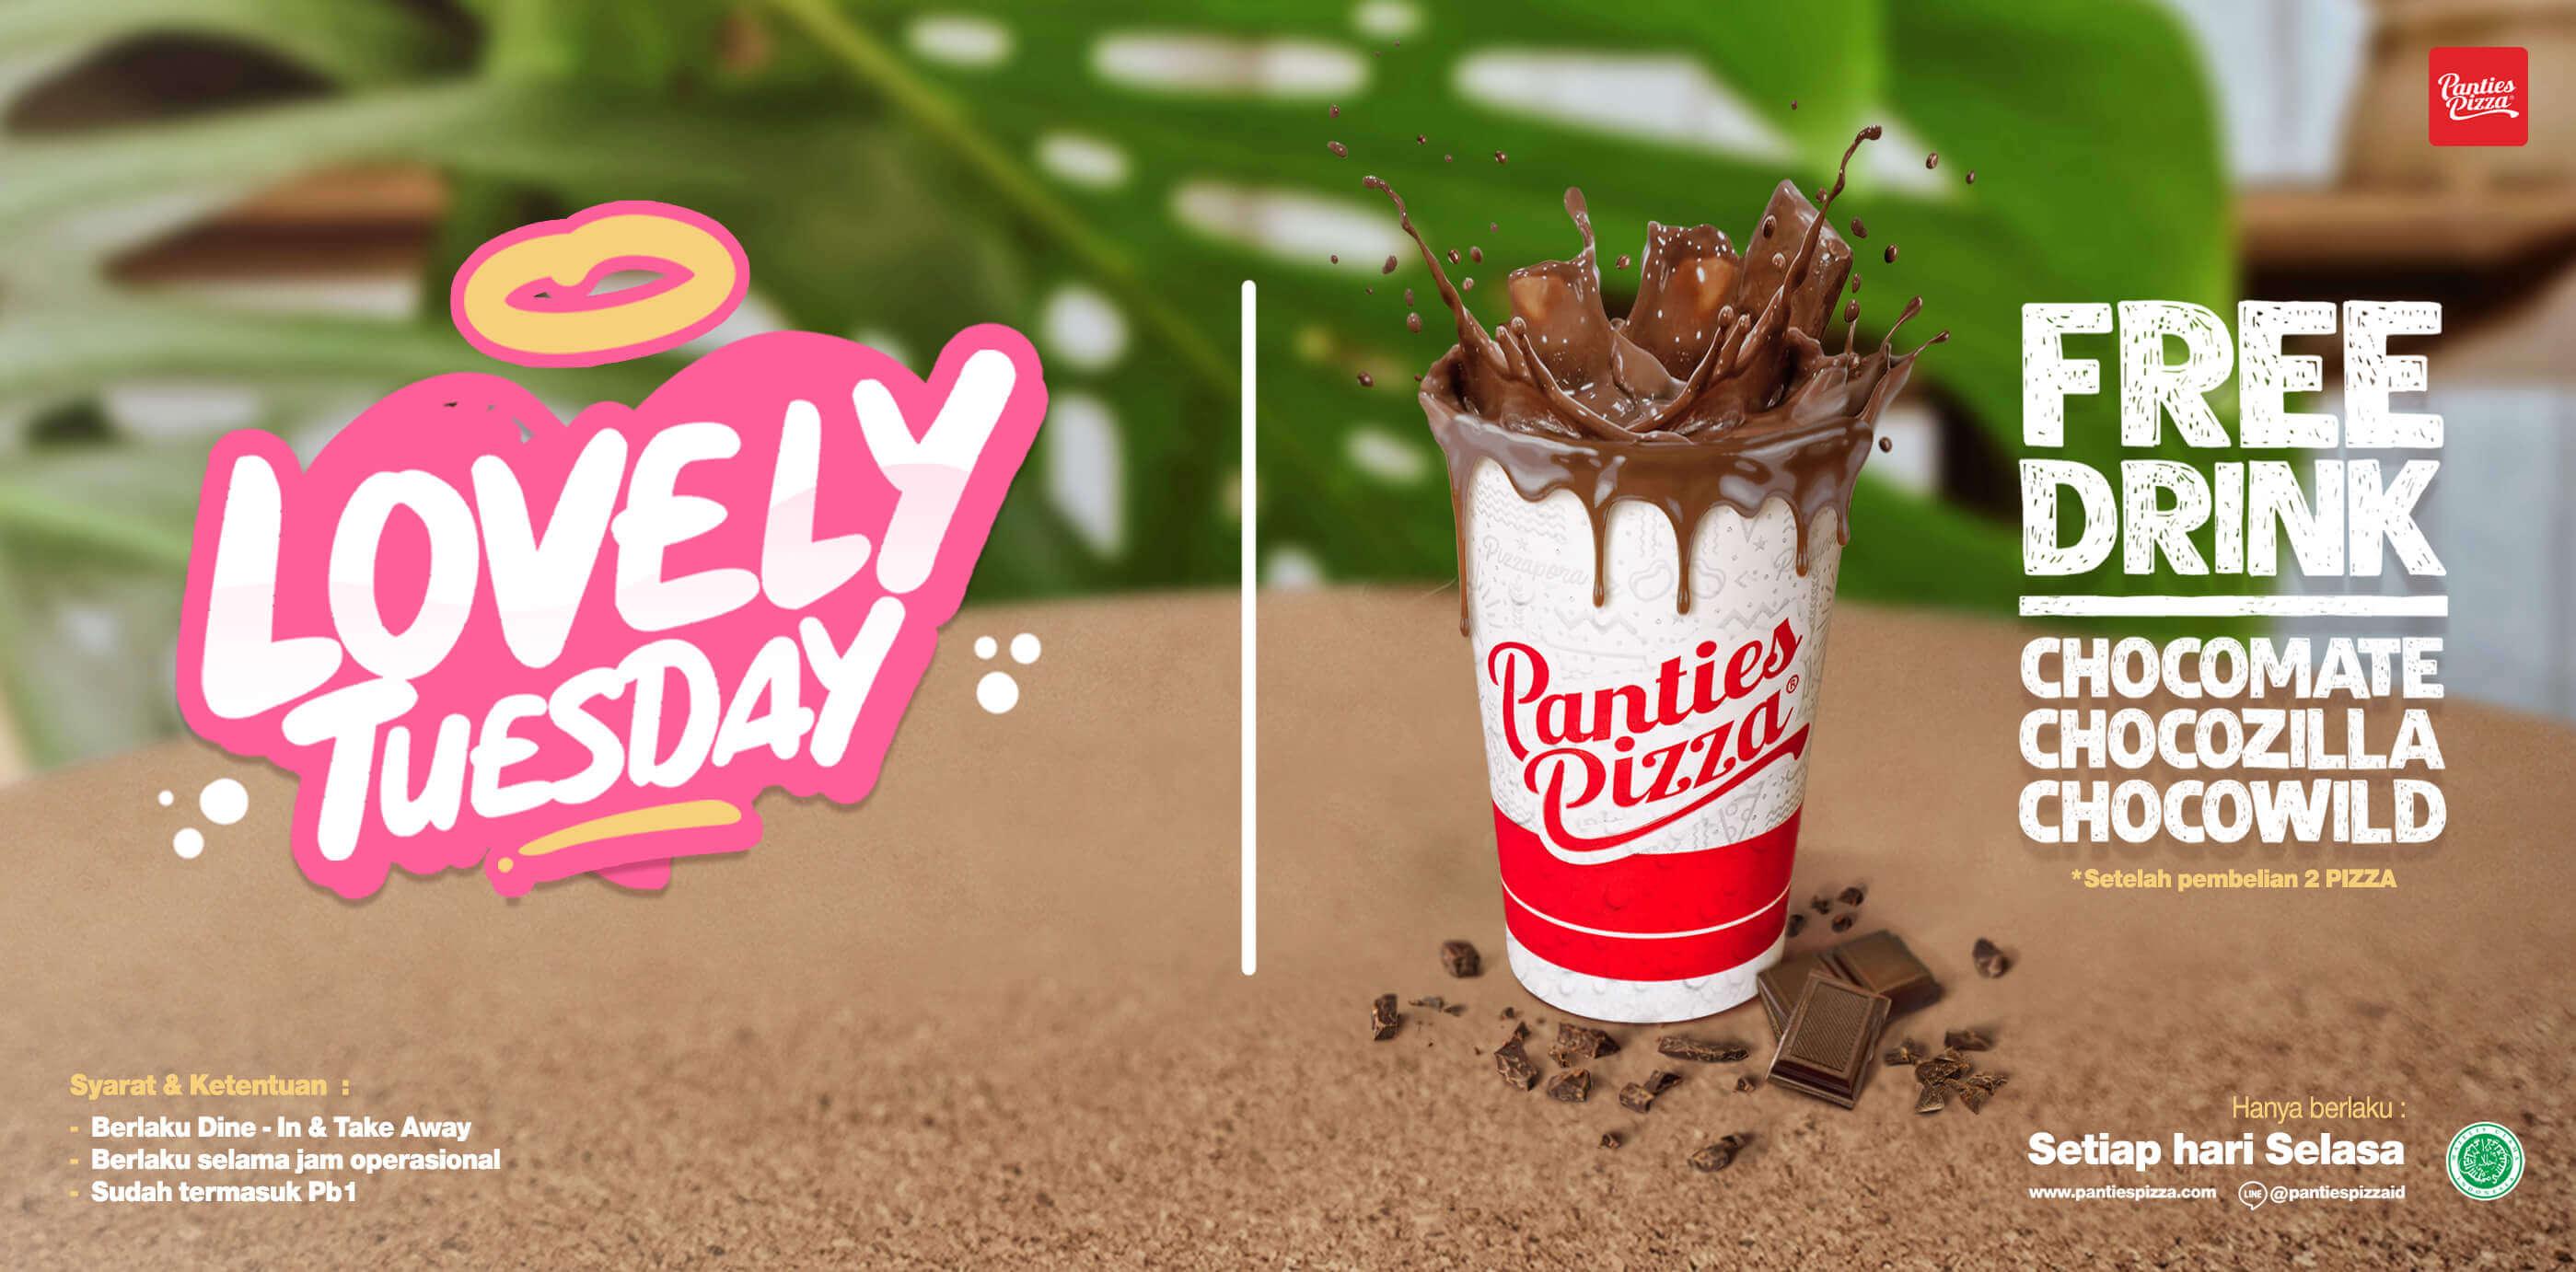 Panties Pizza Promo Bulan Februari 2021 Gratis Minum Chocomate Chocozilla Chocowild Gratis Minum! Setiap Hari Selasa